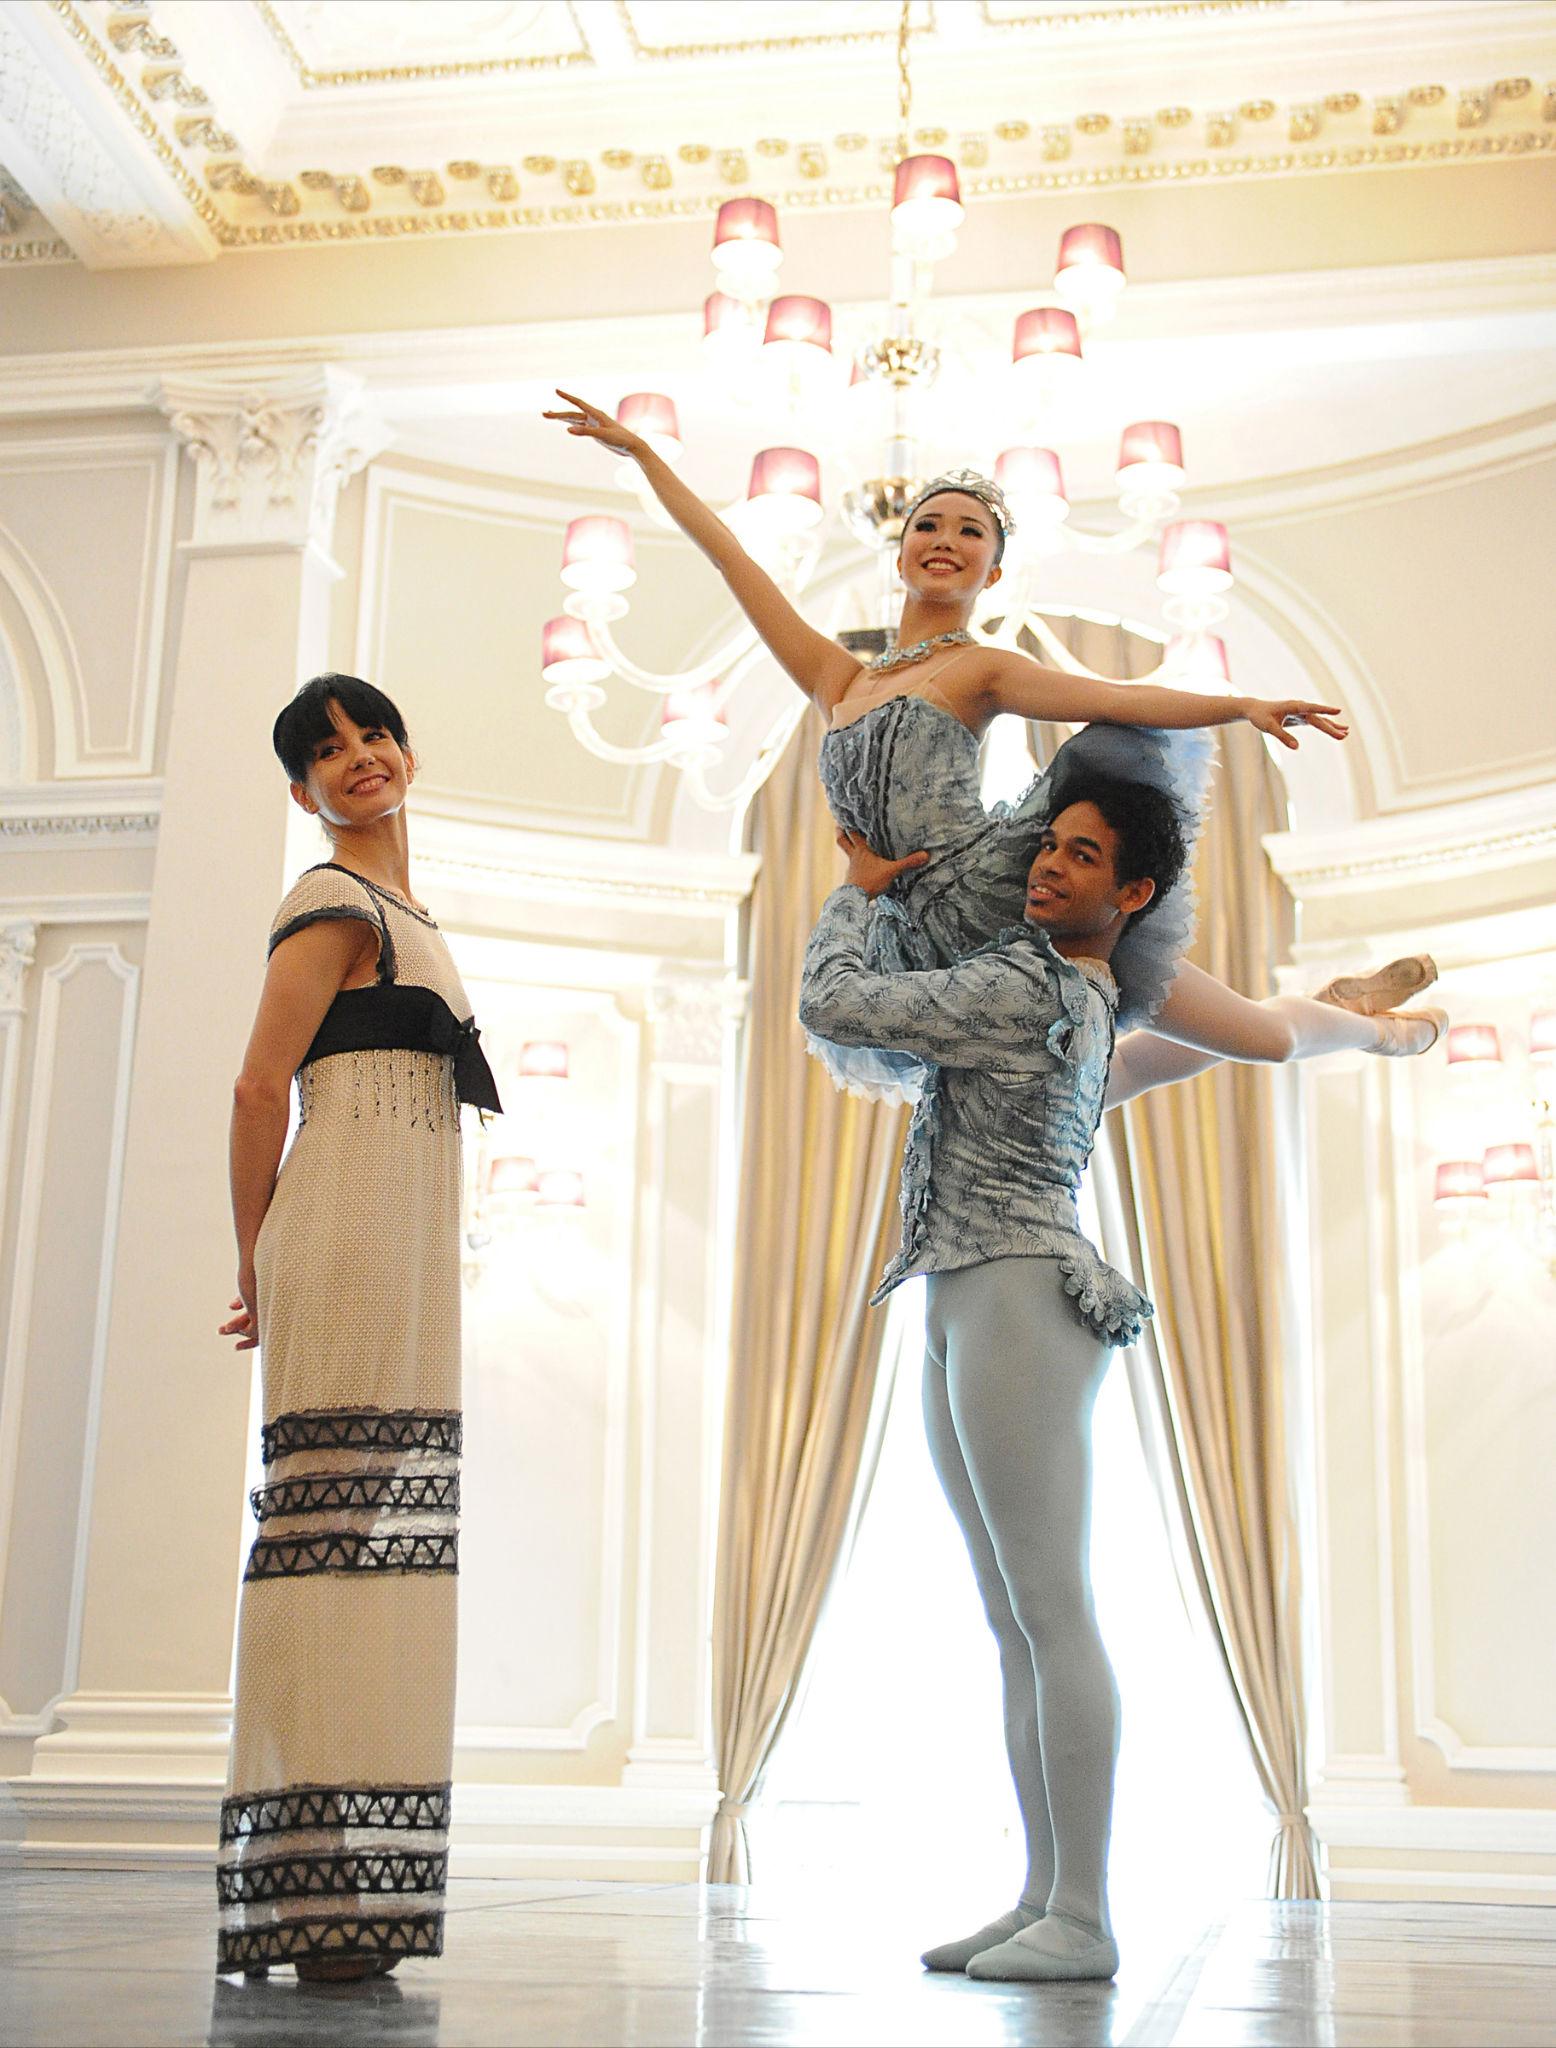 Tamara Rojo, Artistic Director of English National Ballet, with dancers Yonah Acosta and Shiori Kase.